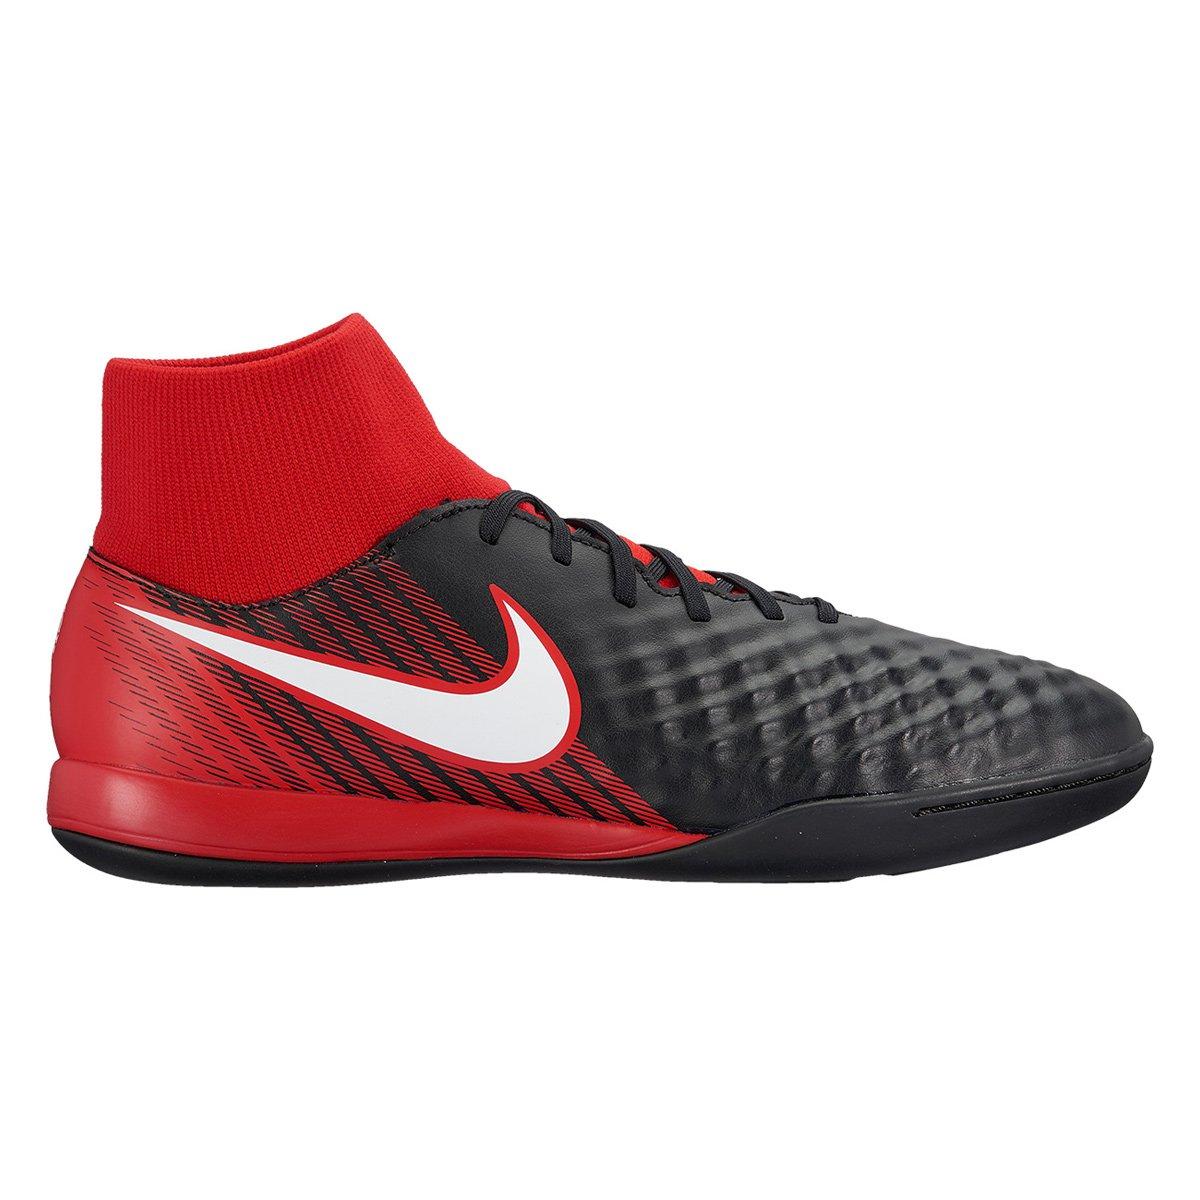 993e350b31 Chuteira Futsal Nike Magista Onda 2 DF IC - Compre Agora